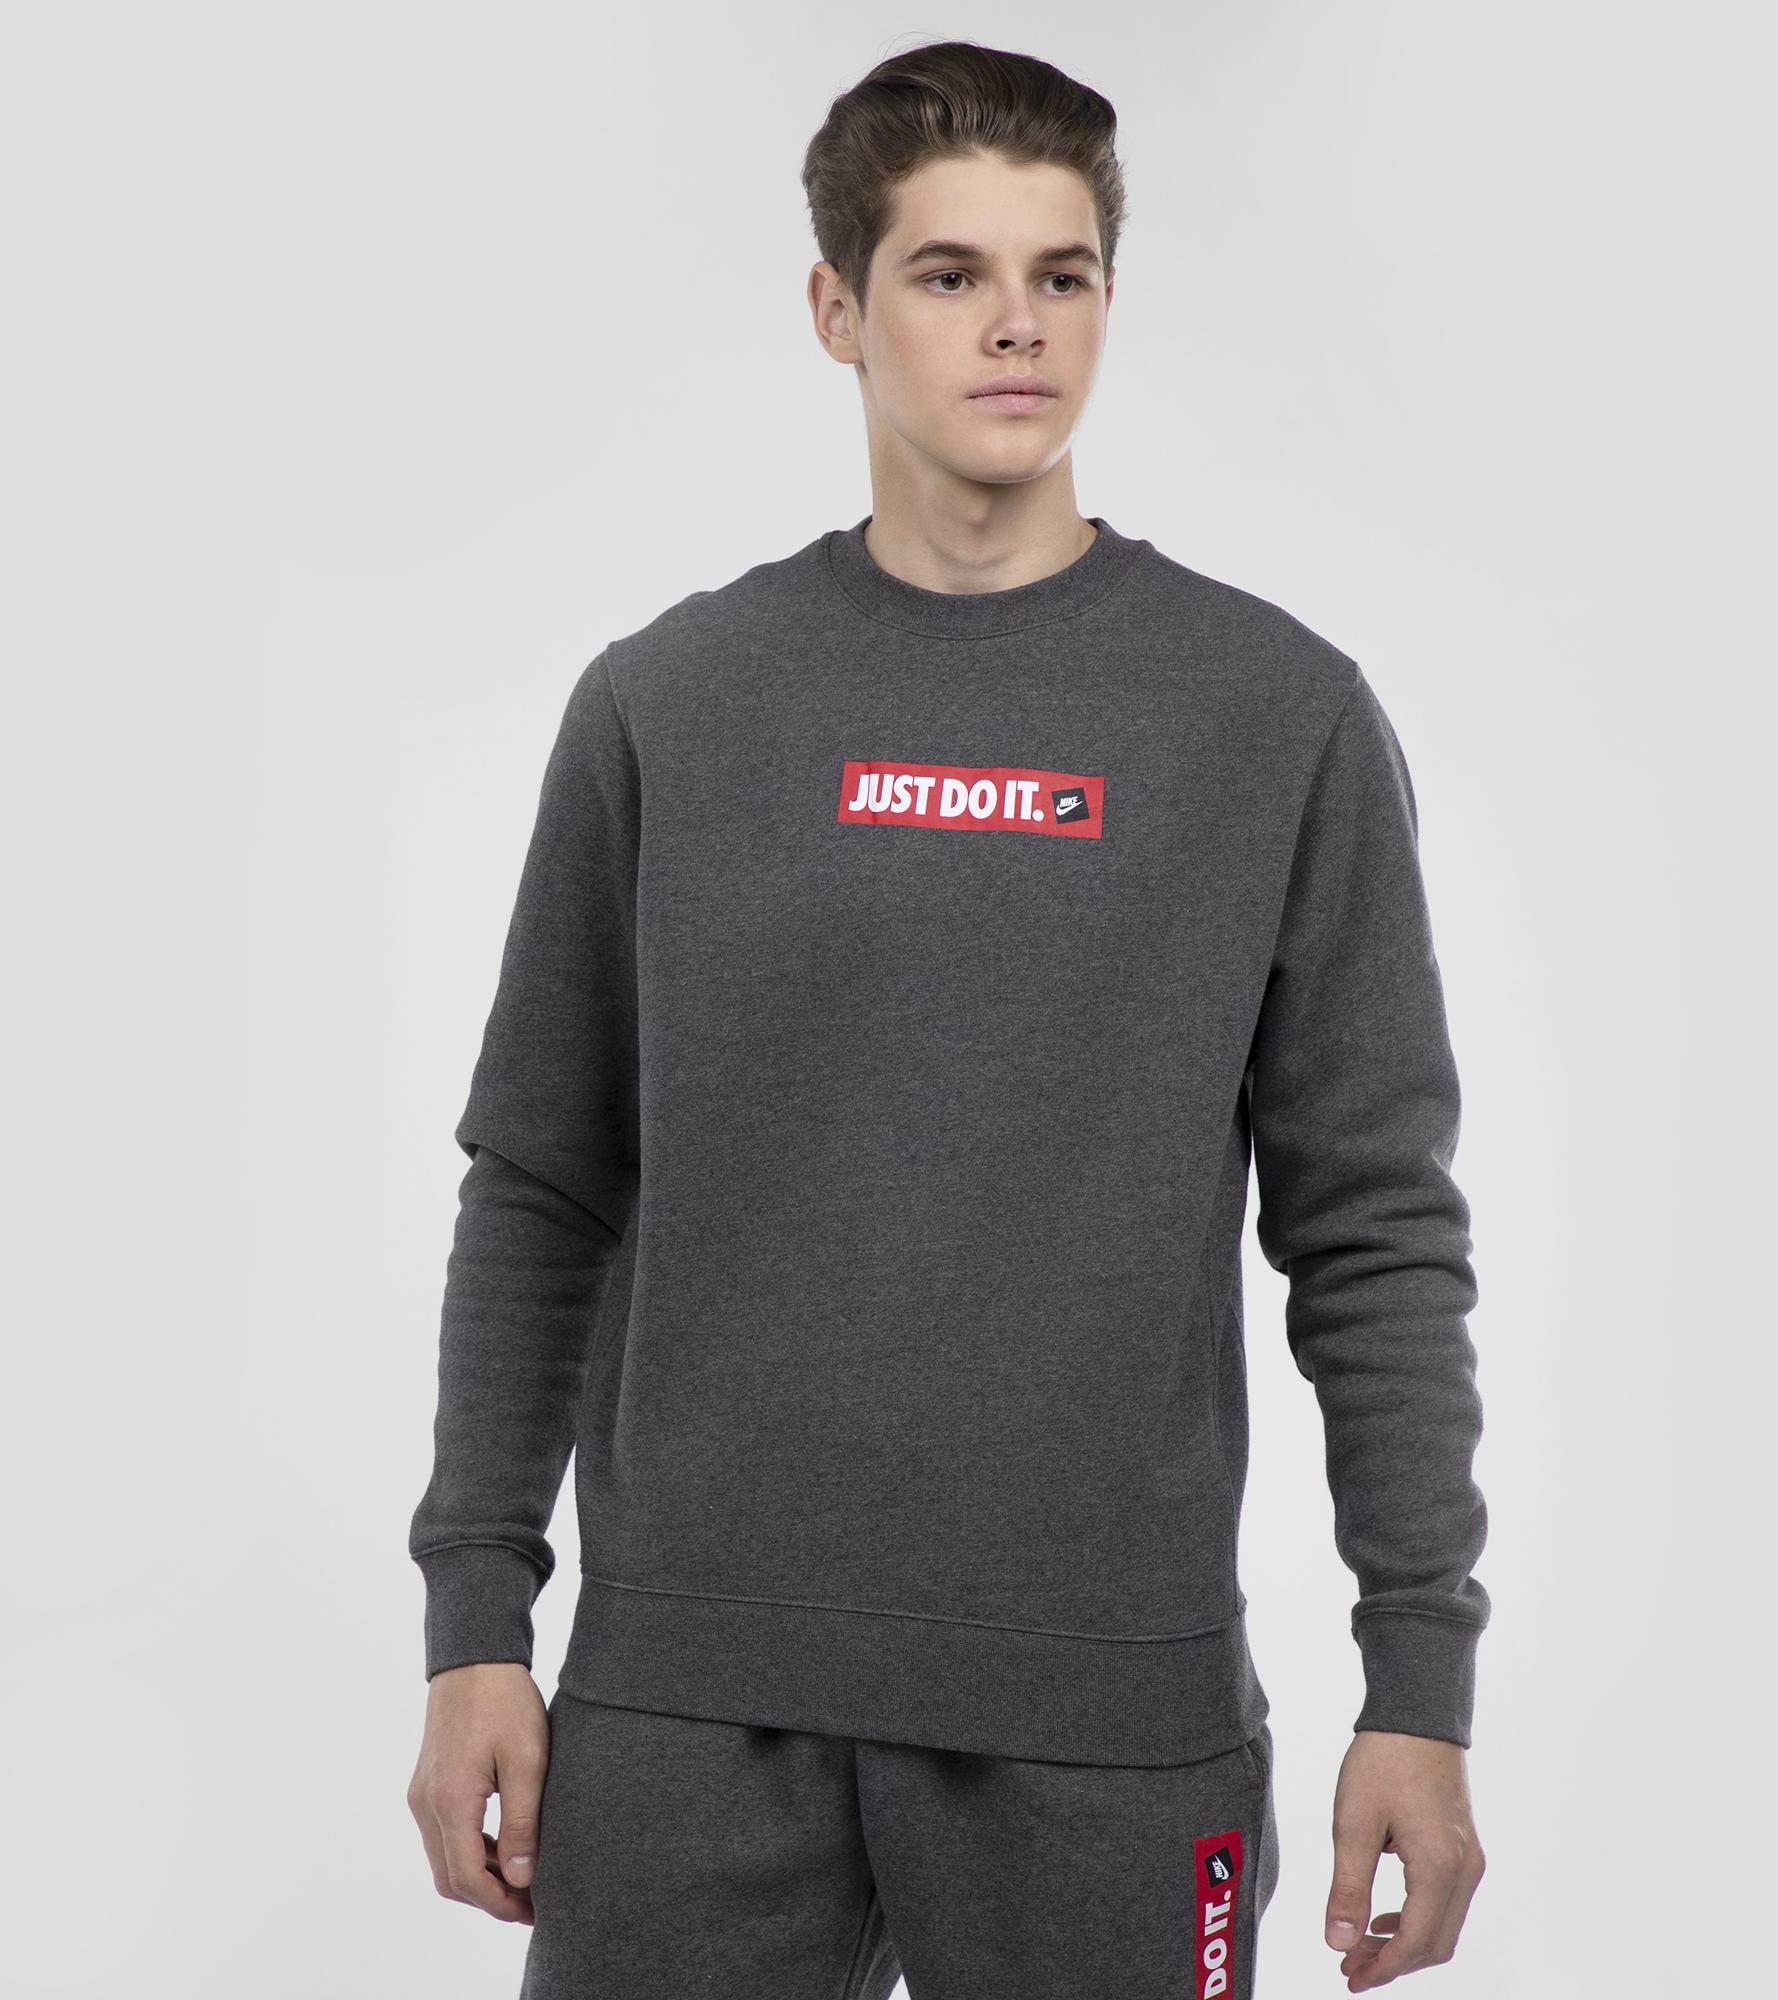 Фото Nike Свитшот мужской Nike JDI Crew, размер 52-54